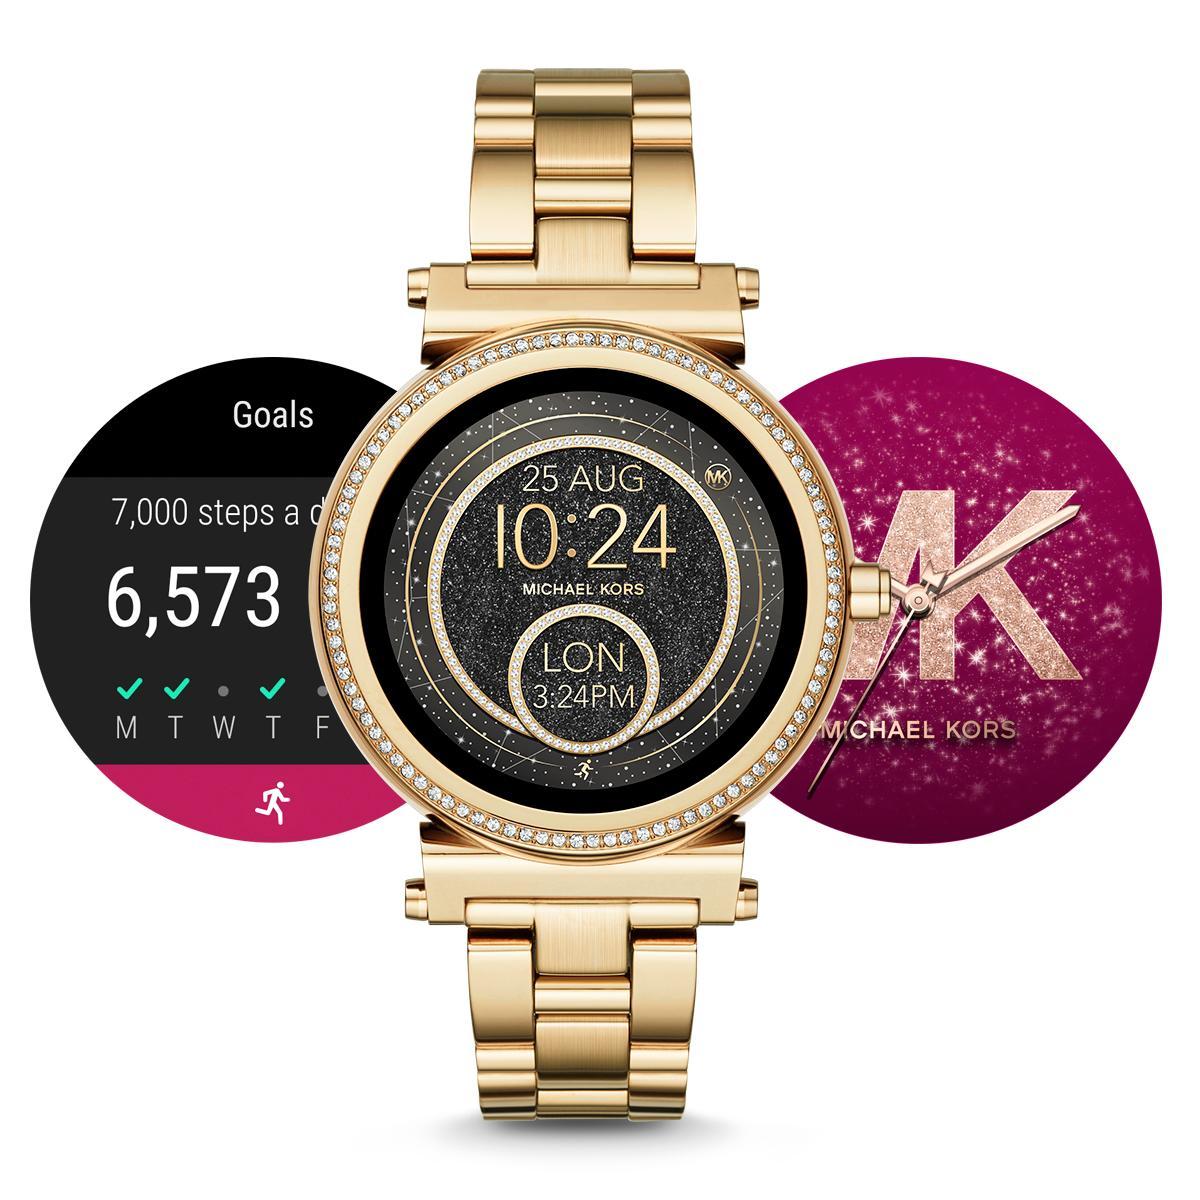 michael kors access smartwatch sofie gen 2 watches. Black Bedroom Furniture Sets. Home Design Ideas